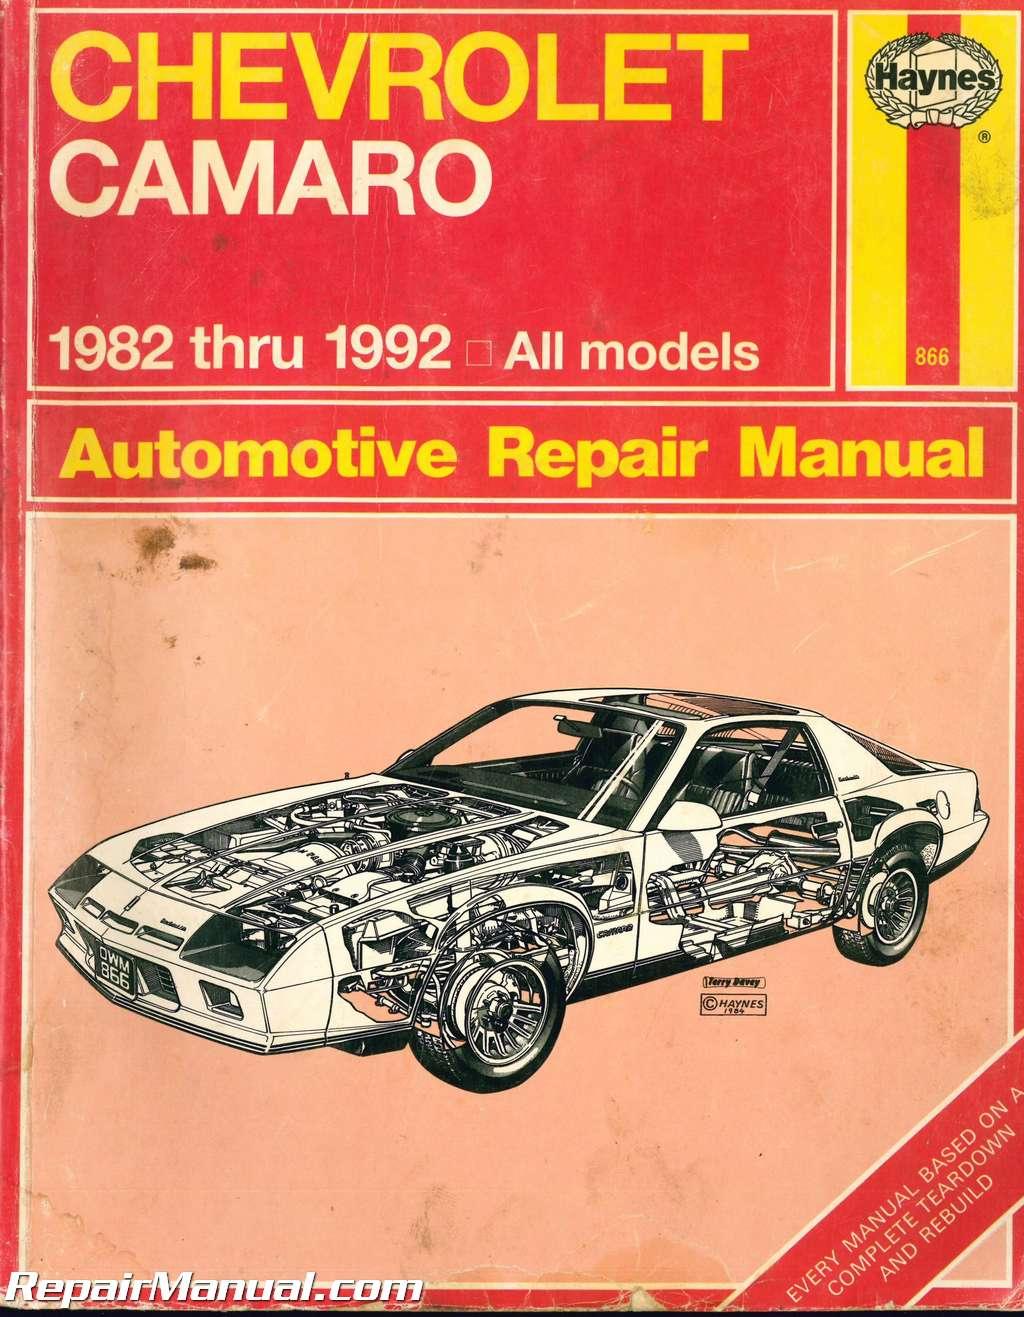 Used Haynes Chevrolet Camaro 1982 1992 Auto Repair Manual